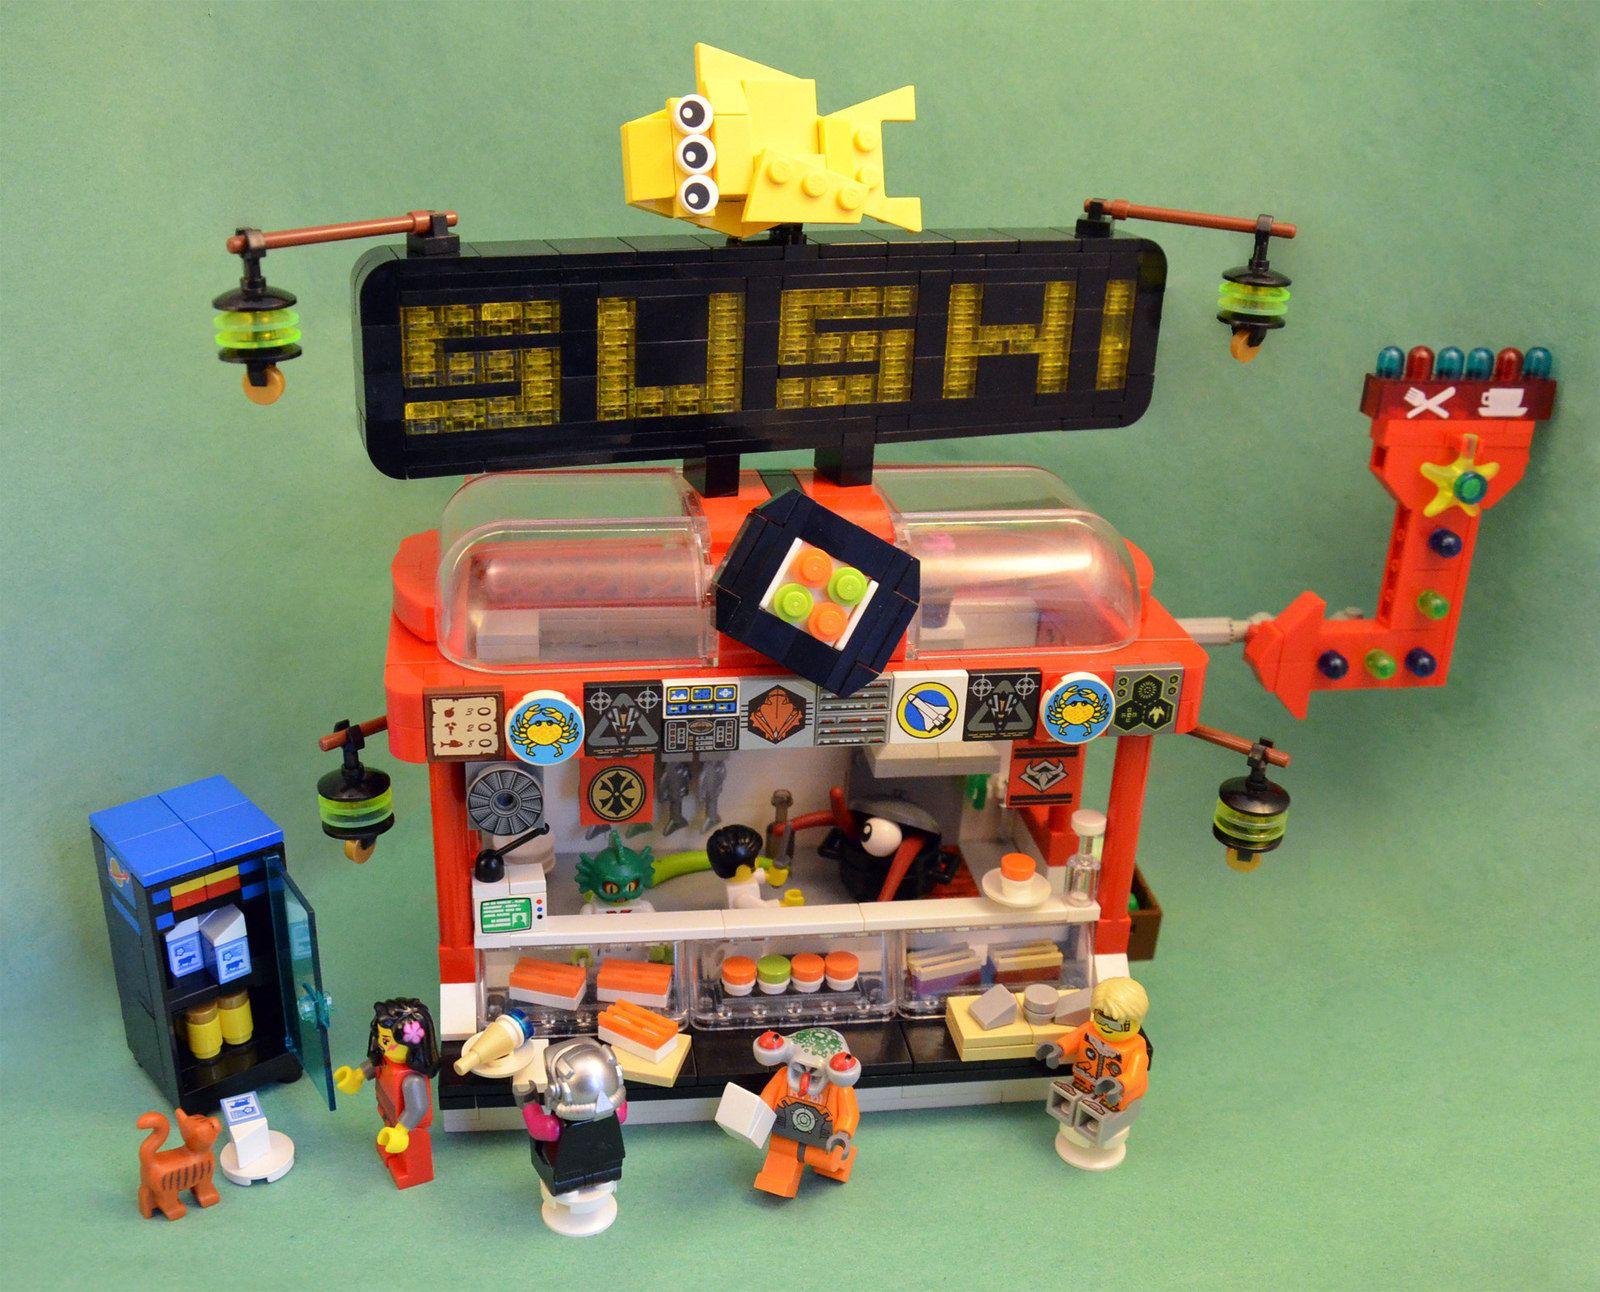 Intergalactic sushi 03 cool lego creations lego